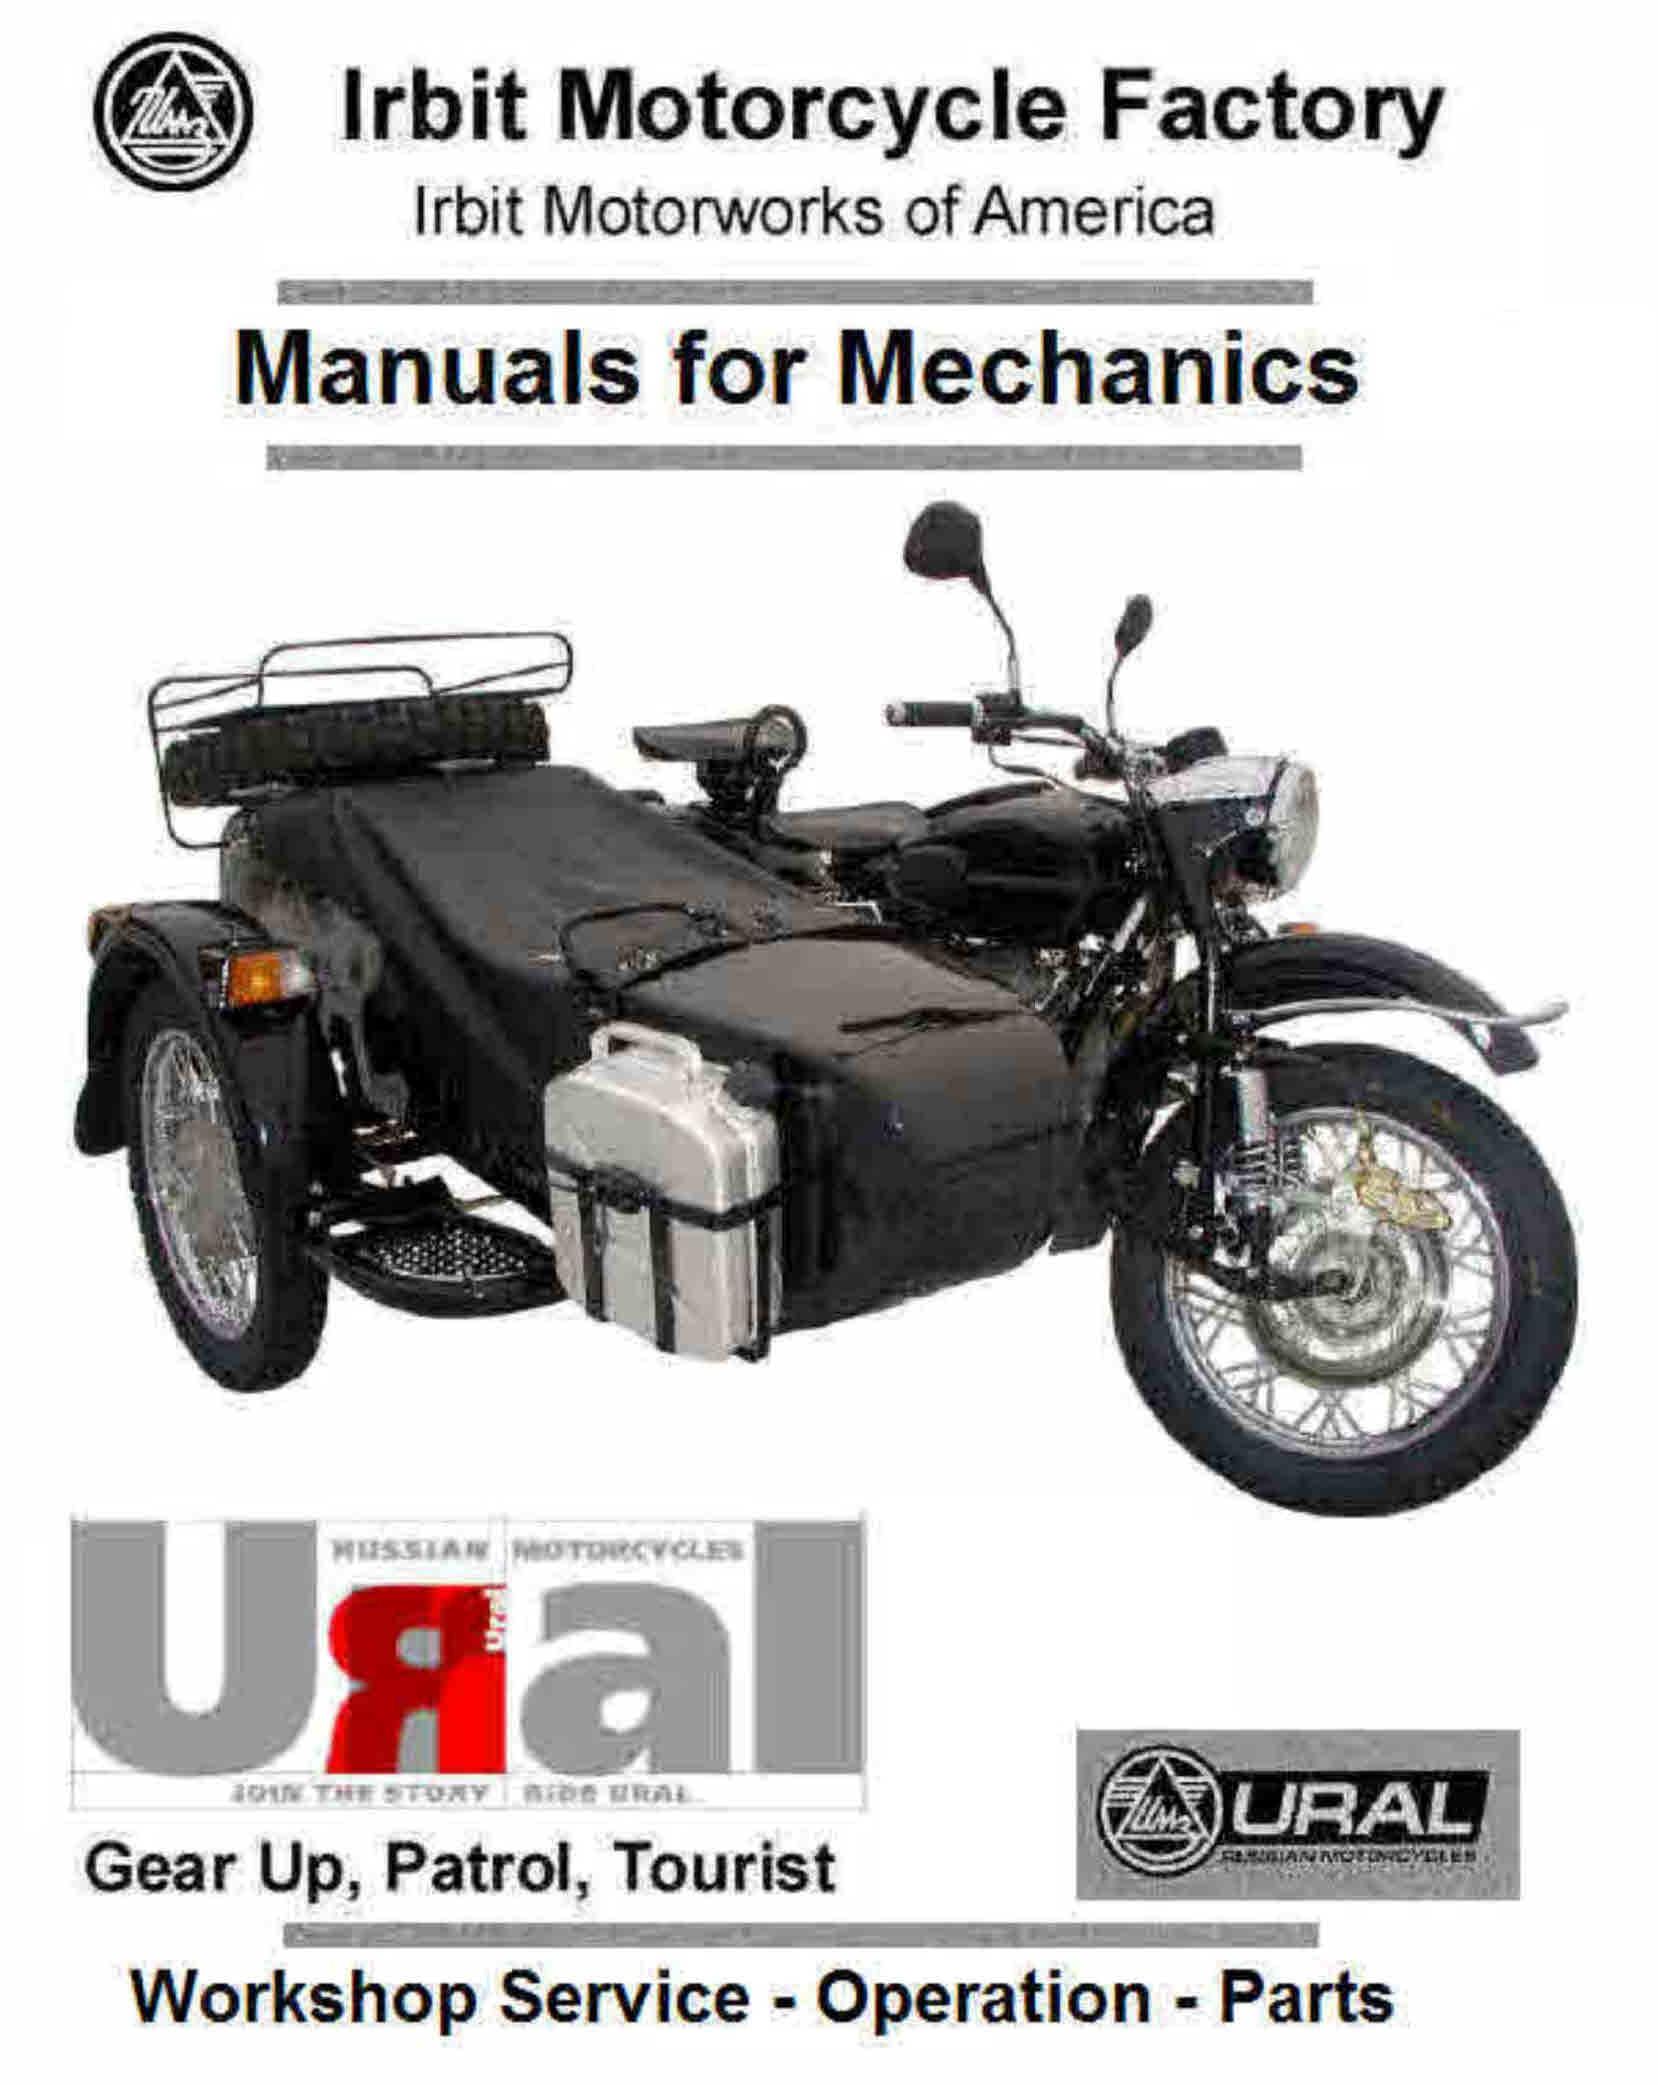 Ural Motorcycle Groups Wiring Diagrams Data Base Engine Diagram Manauls For Mechanics Themanualman Rh Sellfy Com On Xingyue